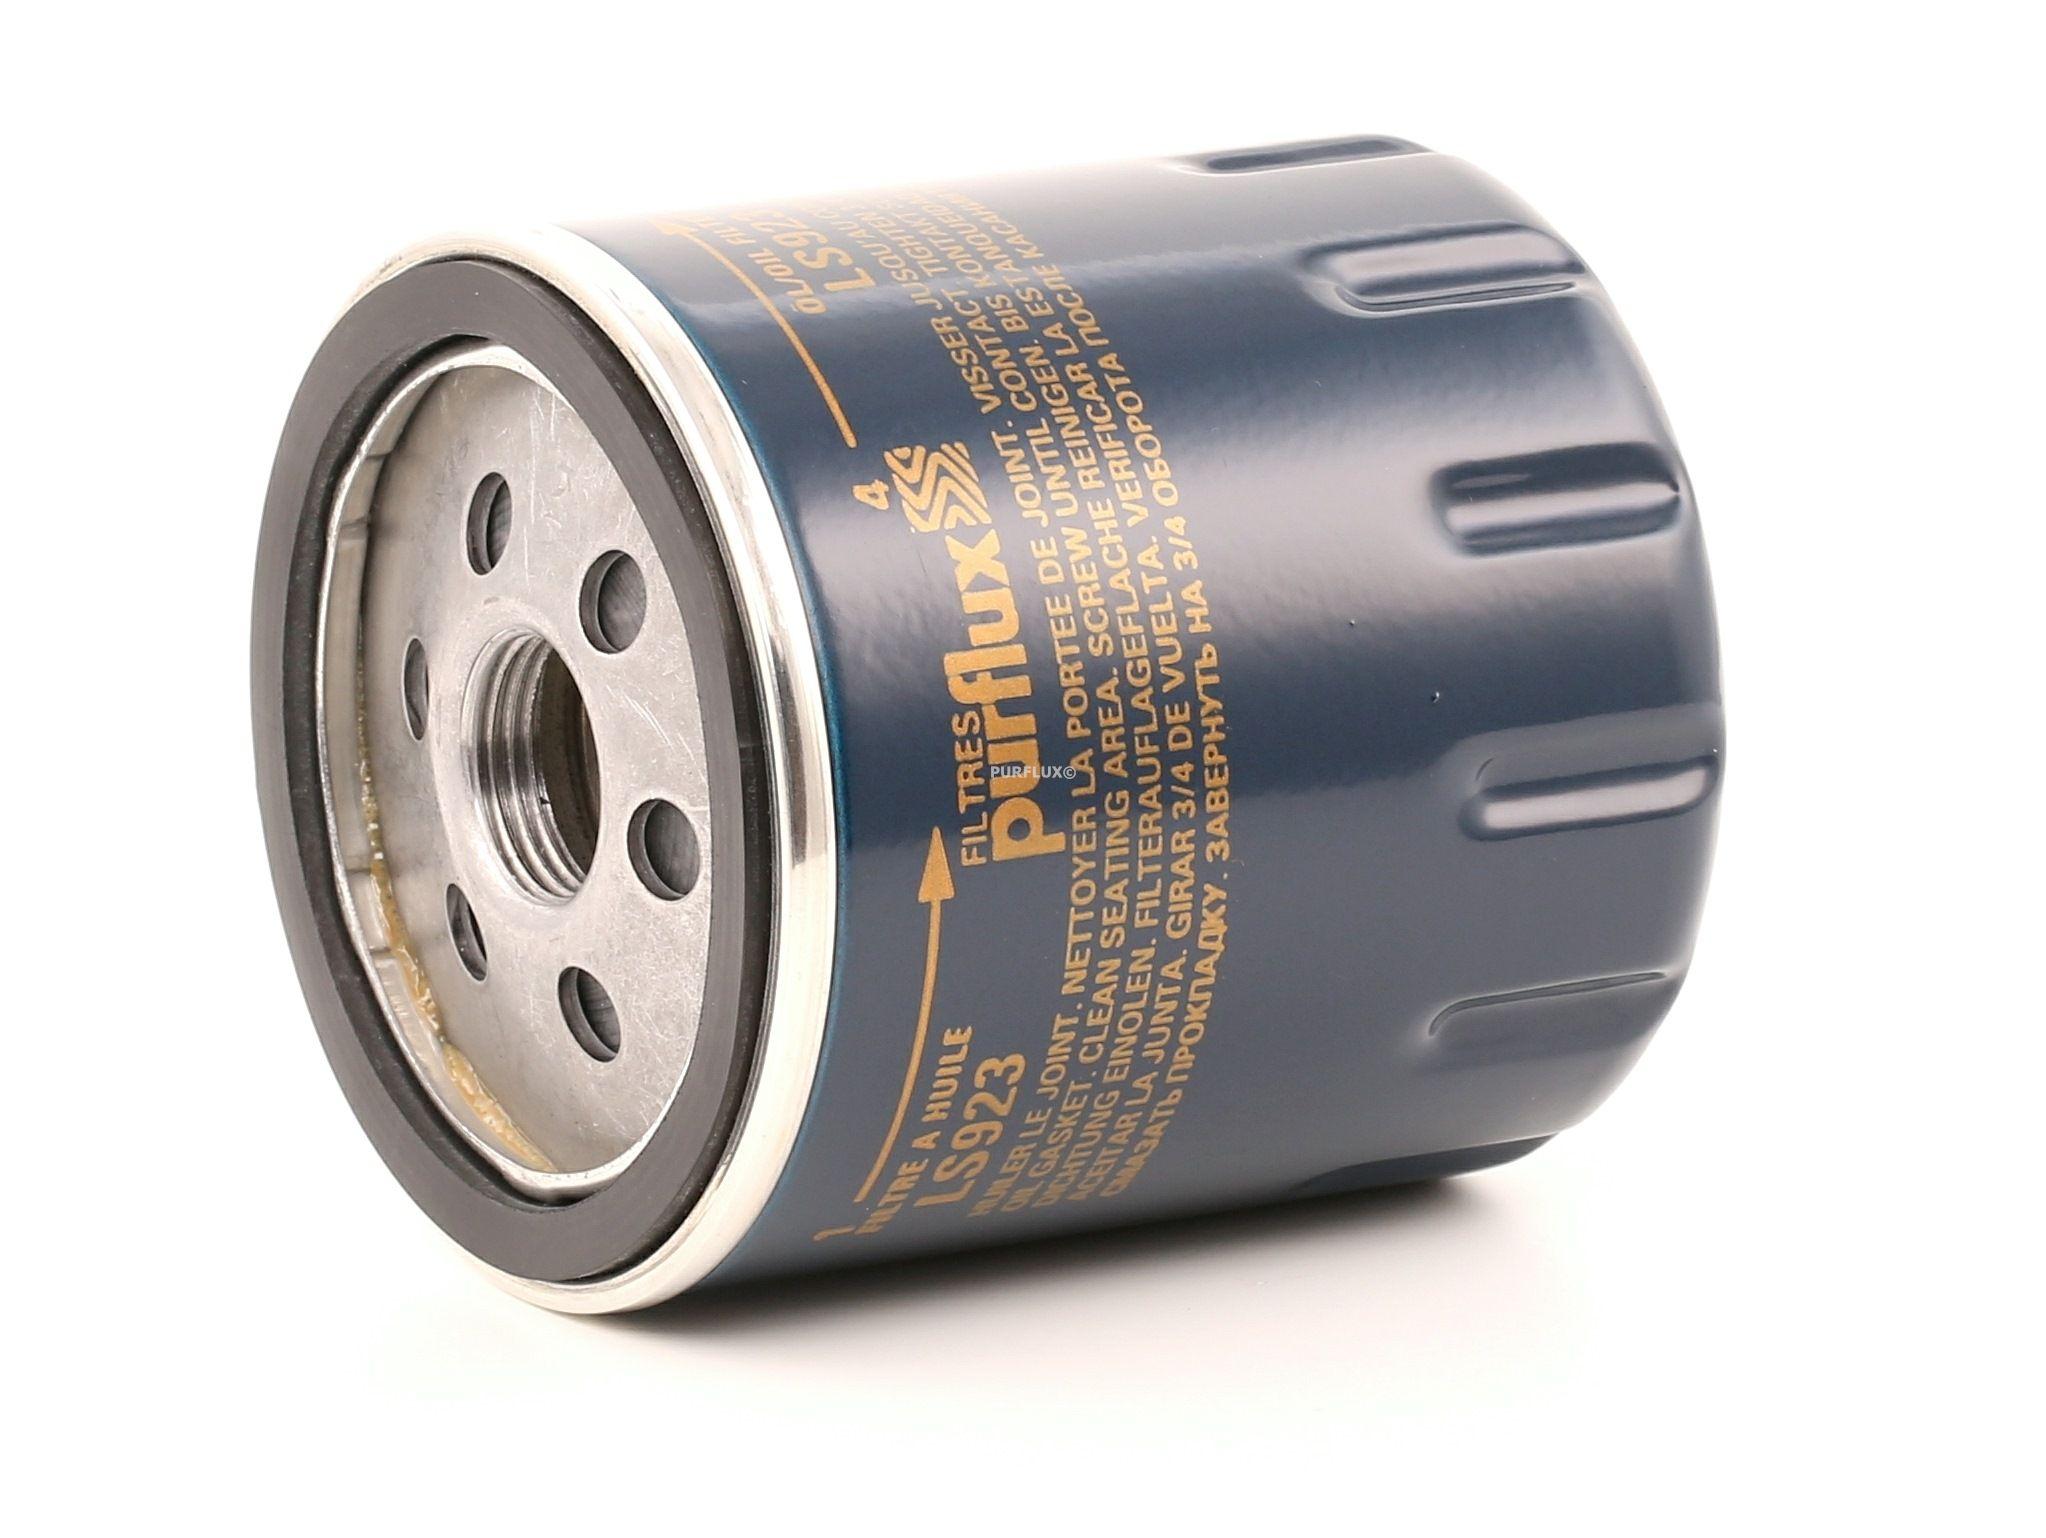 LS923 PURFLUX Anschraubfilter Ø: 76mm, Höhe: 85mm Ölfilter LS923 kaufen